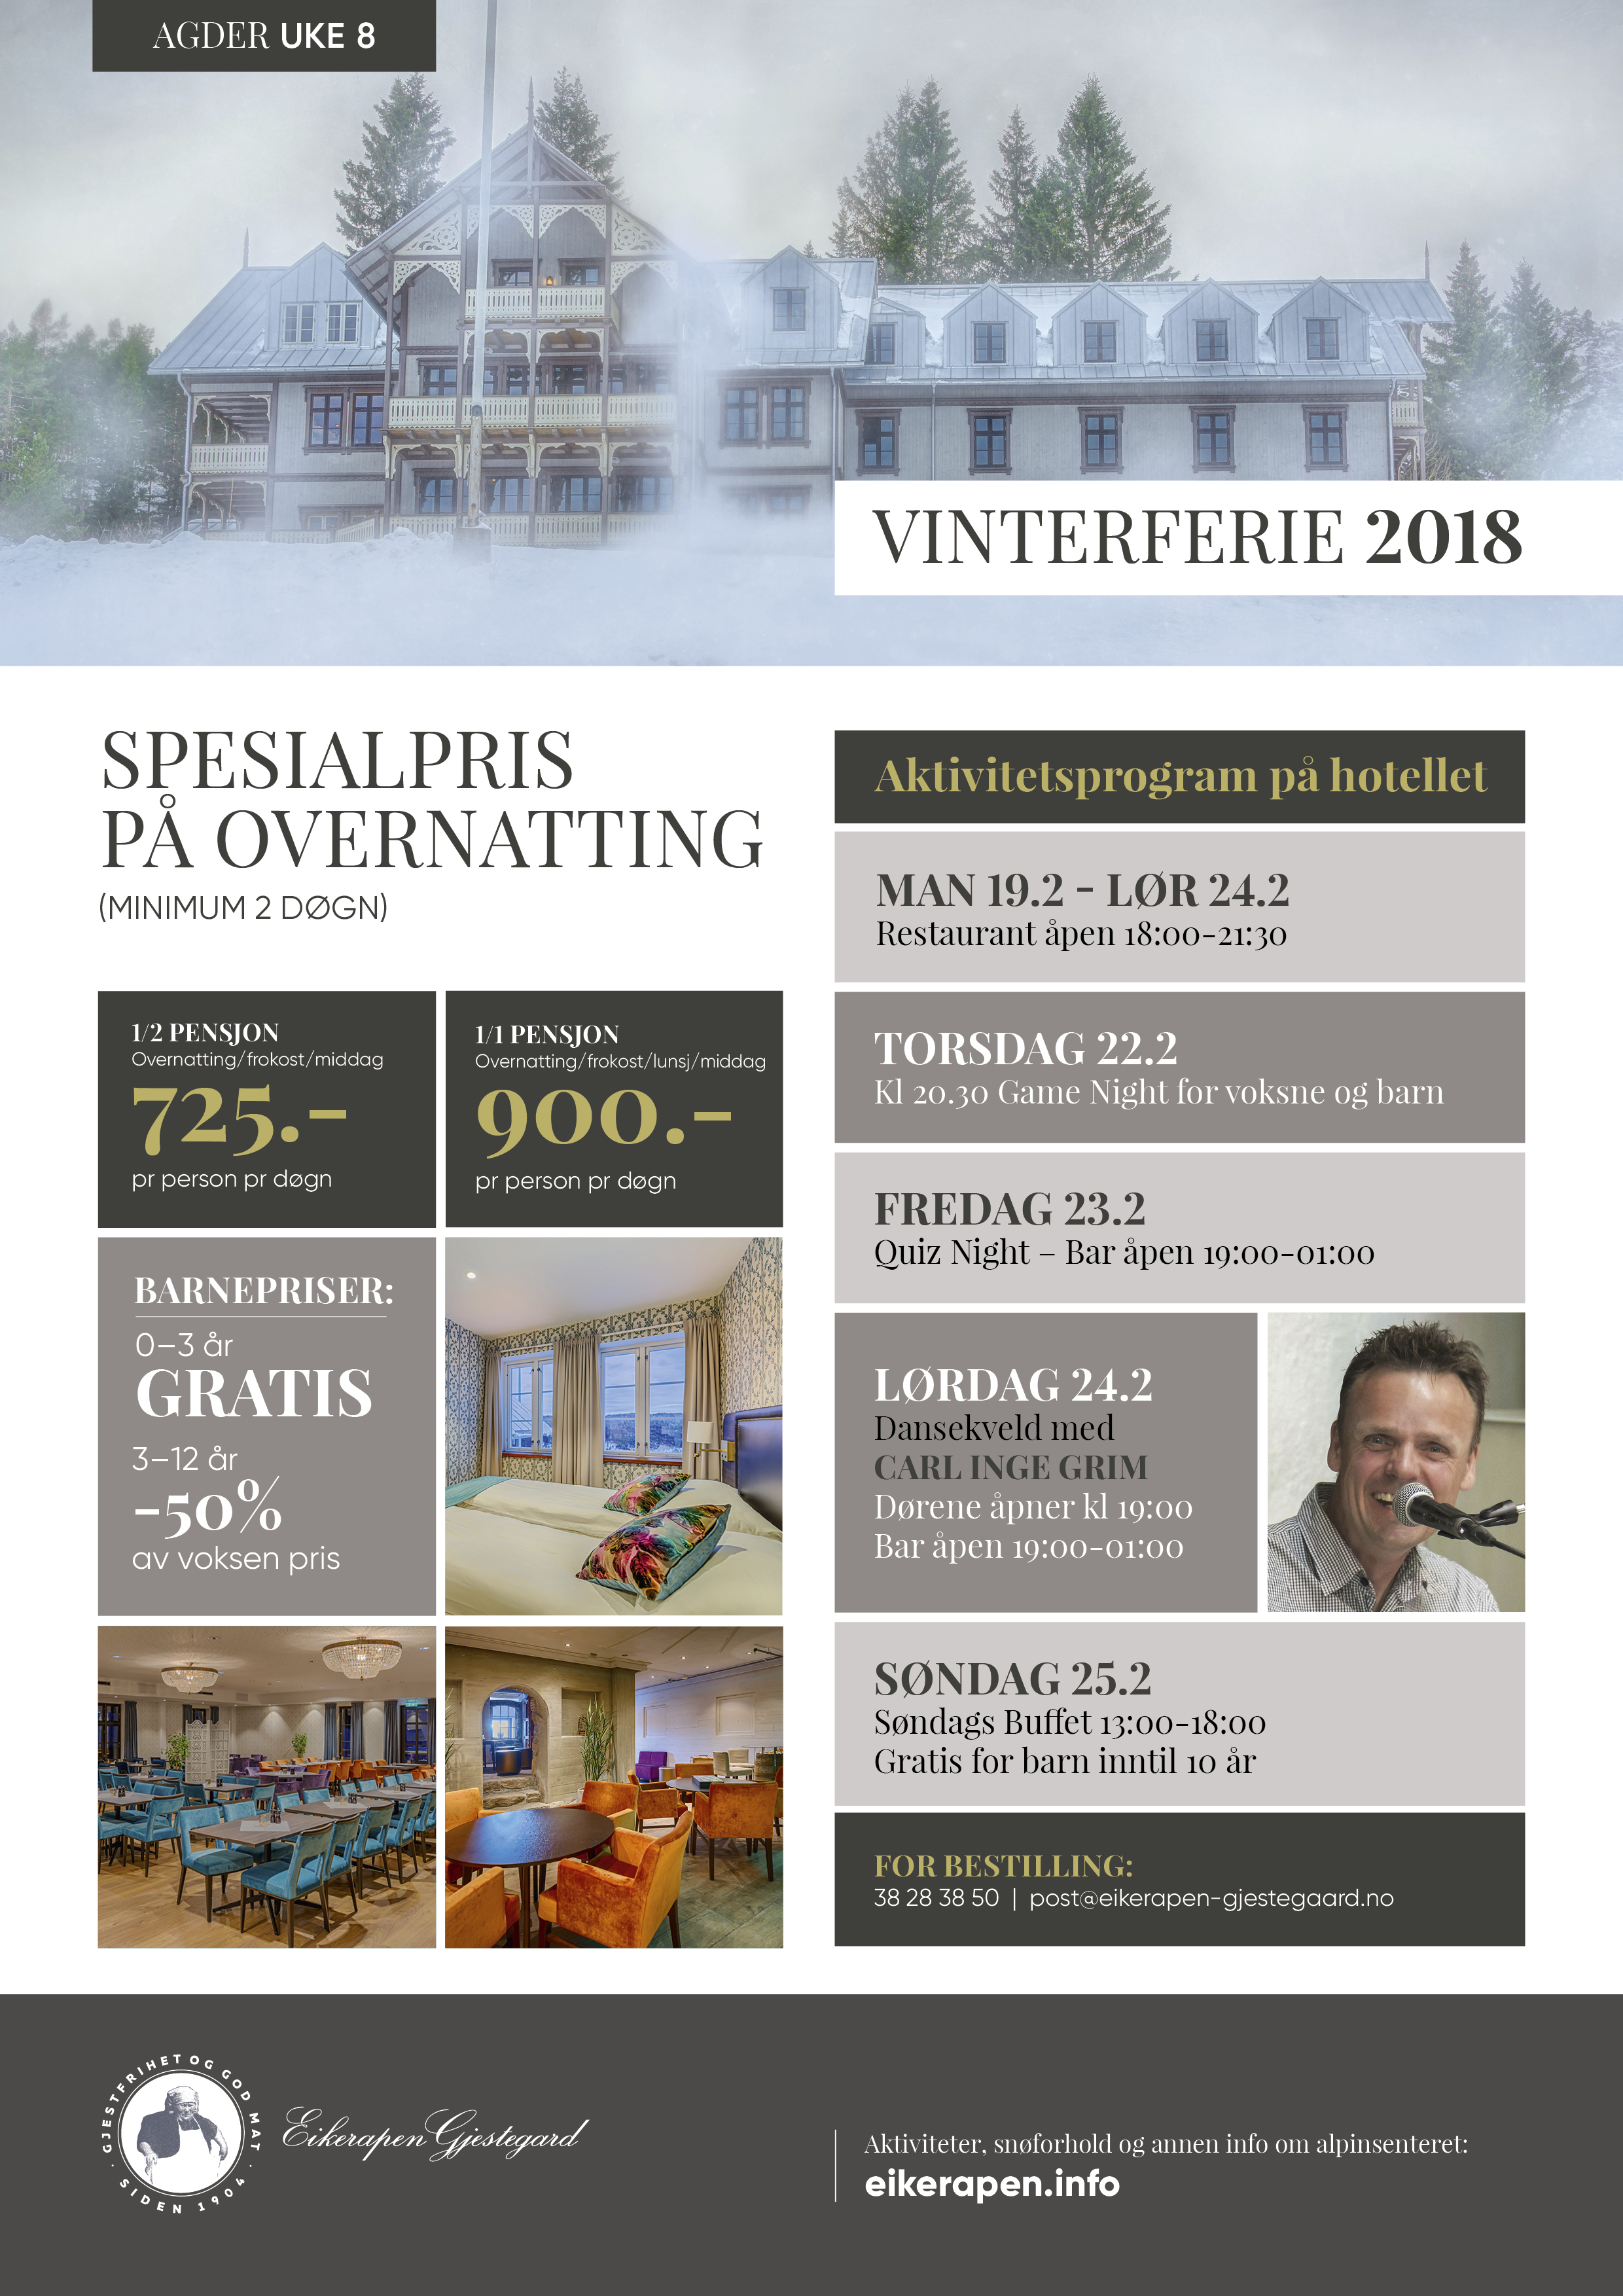 Vinterferie 2018 Agder